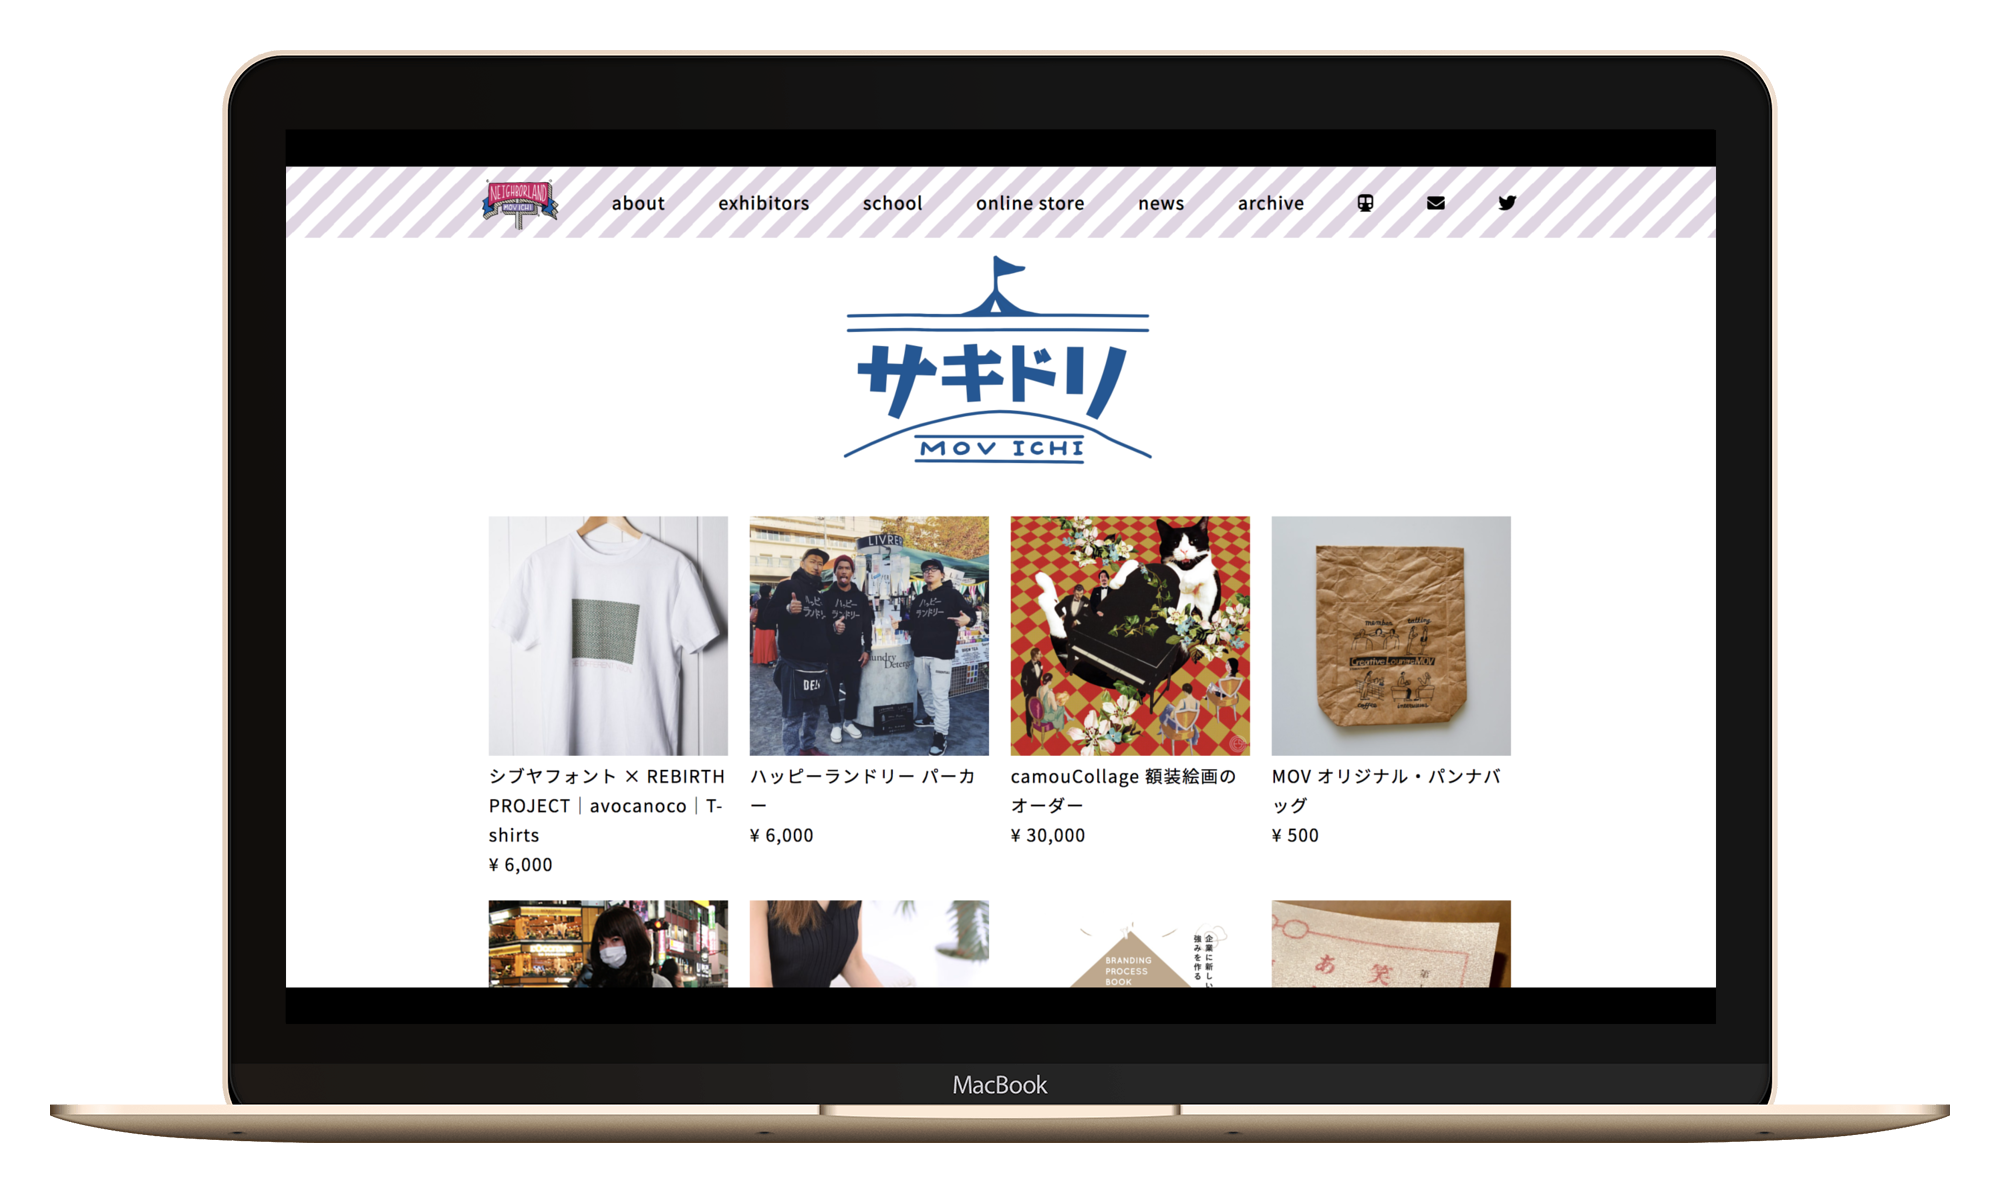 sakidori_macbookgold_front.png